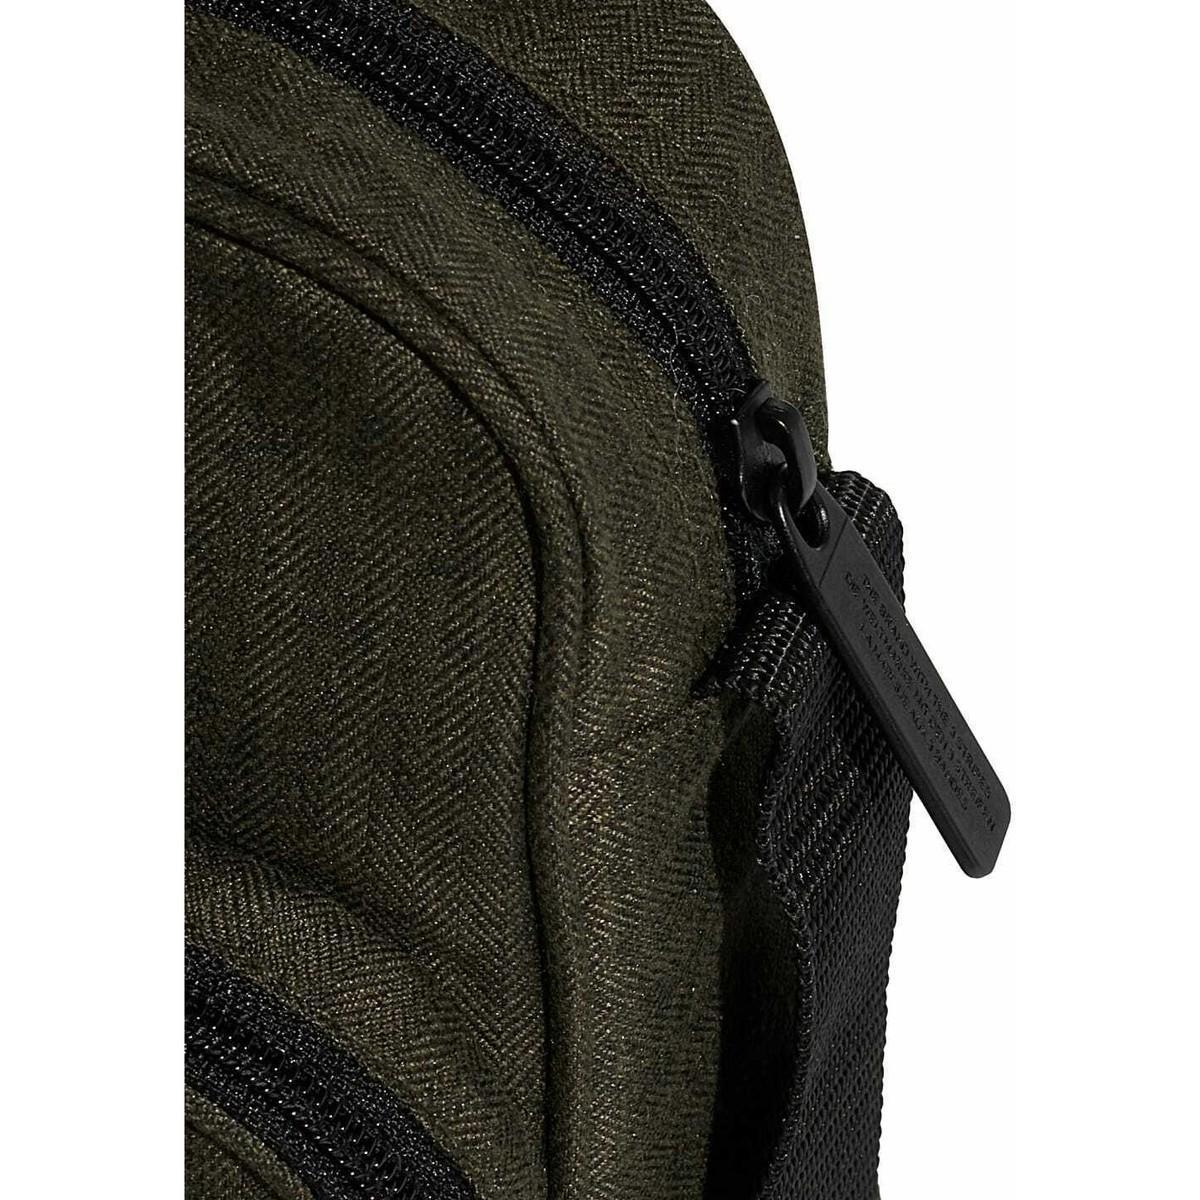 adidas Handtaschen ORIGINALS Mini Casual - Mochila de mensajero in Grün für Herren TGPXY